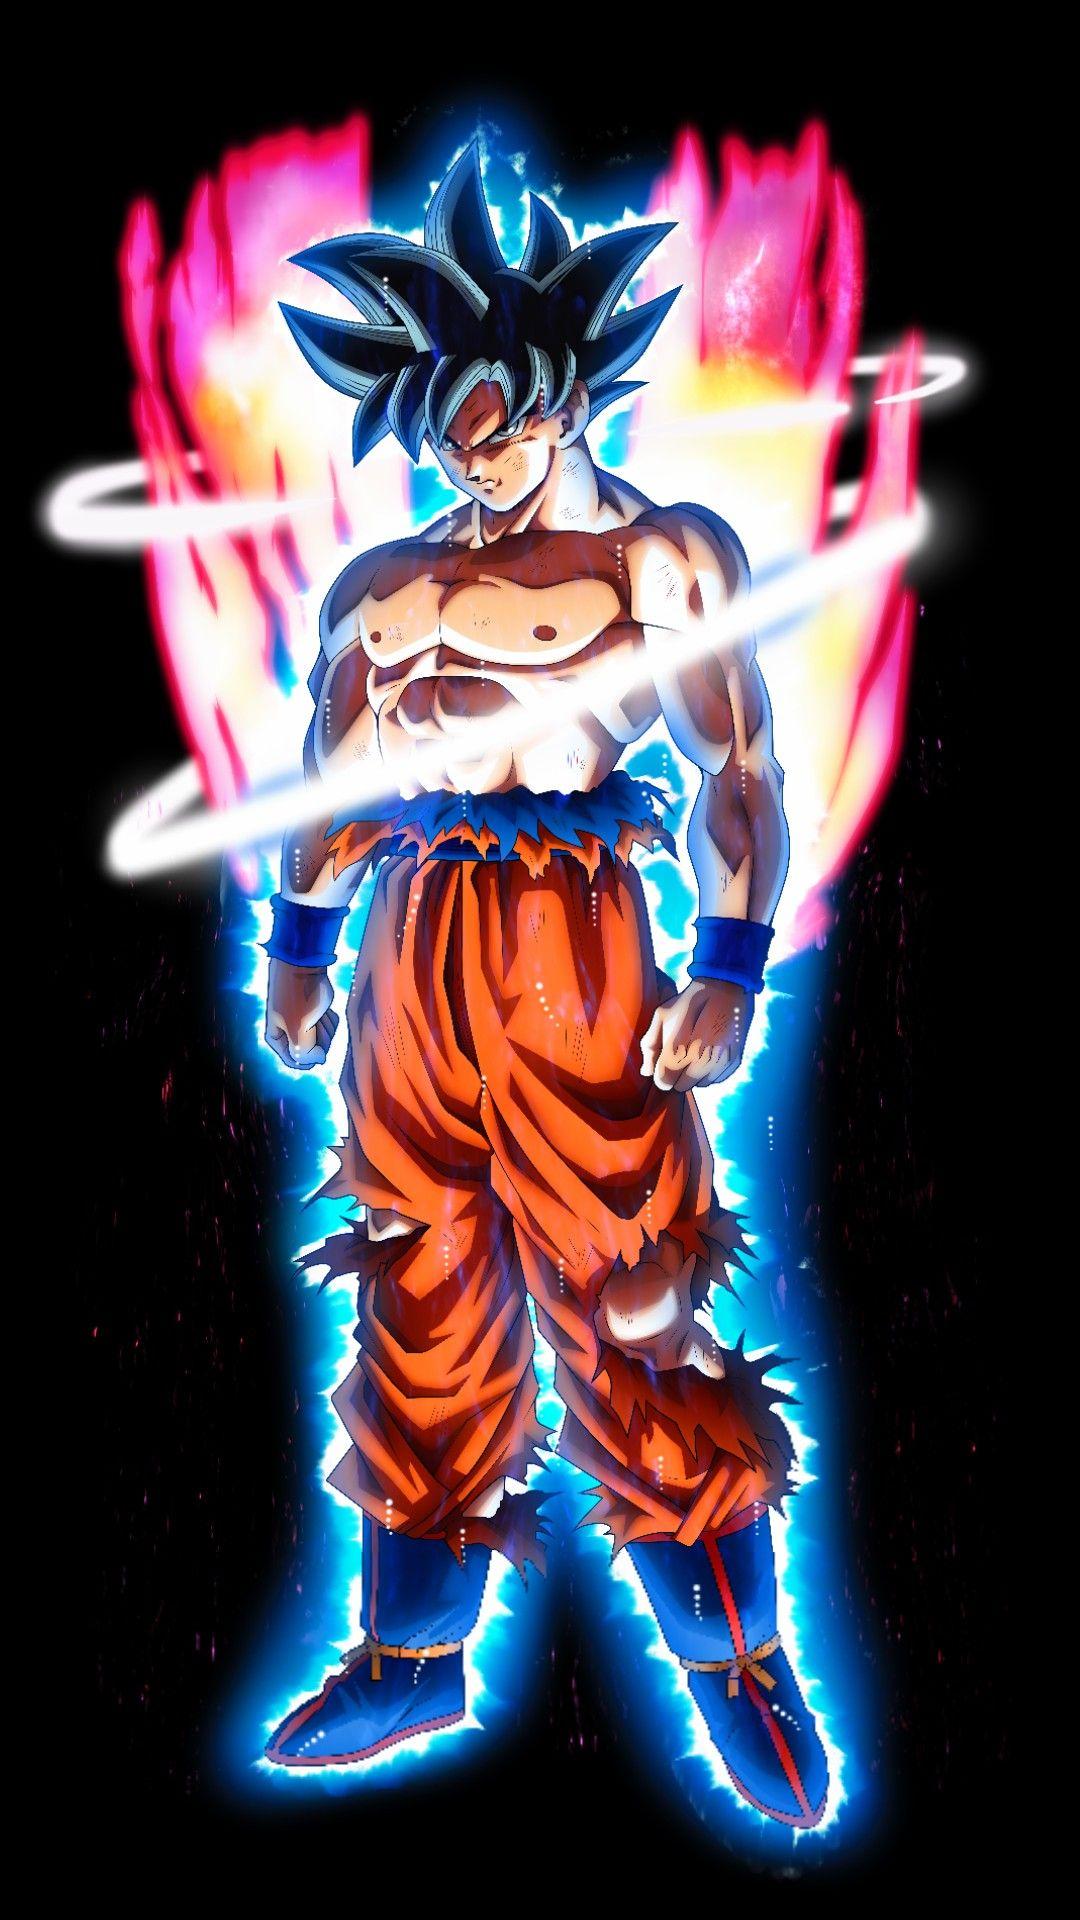 Tony Tony Chopper Wallpaper Hd Goku Ultra Instinto Vida Dragon Ball Pinterest